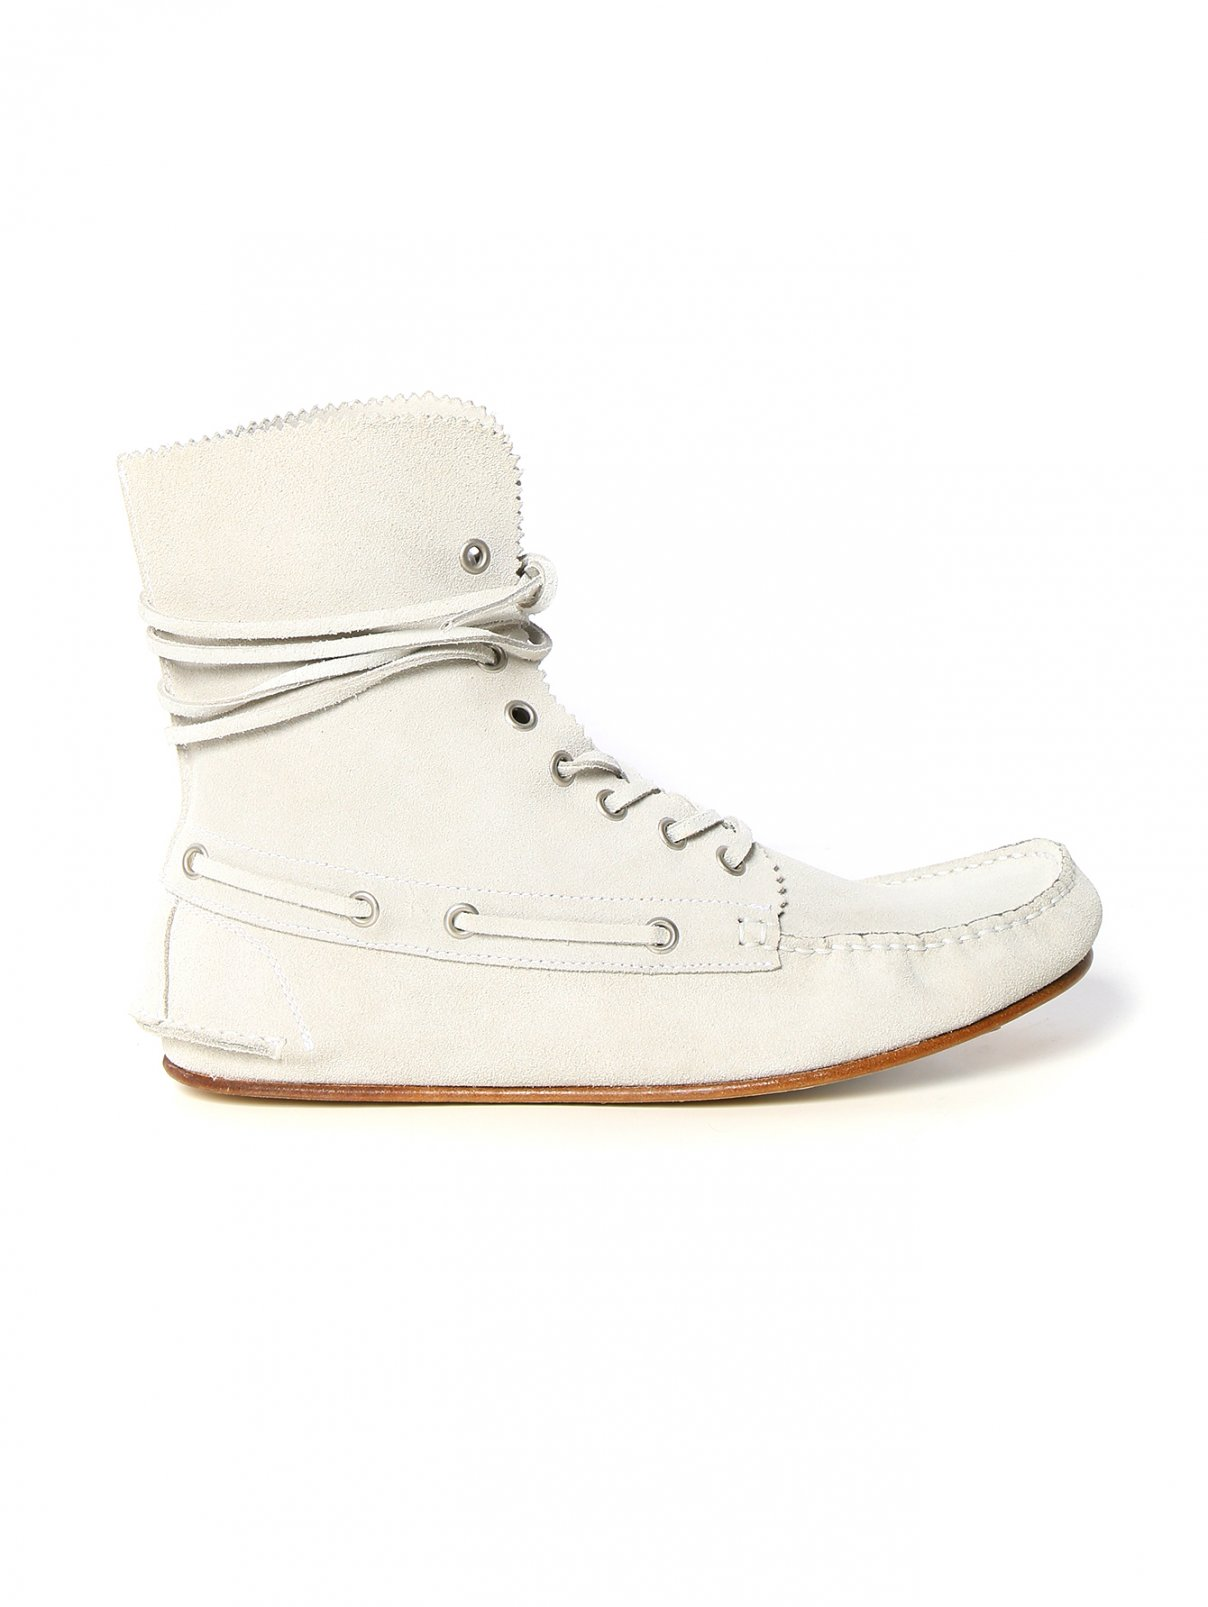 Ботинки из замши на шнуровке Philosophy di Lorenzo Serafini  –  Модель Общий вид  – Цвет:  Серый